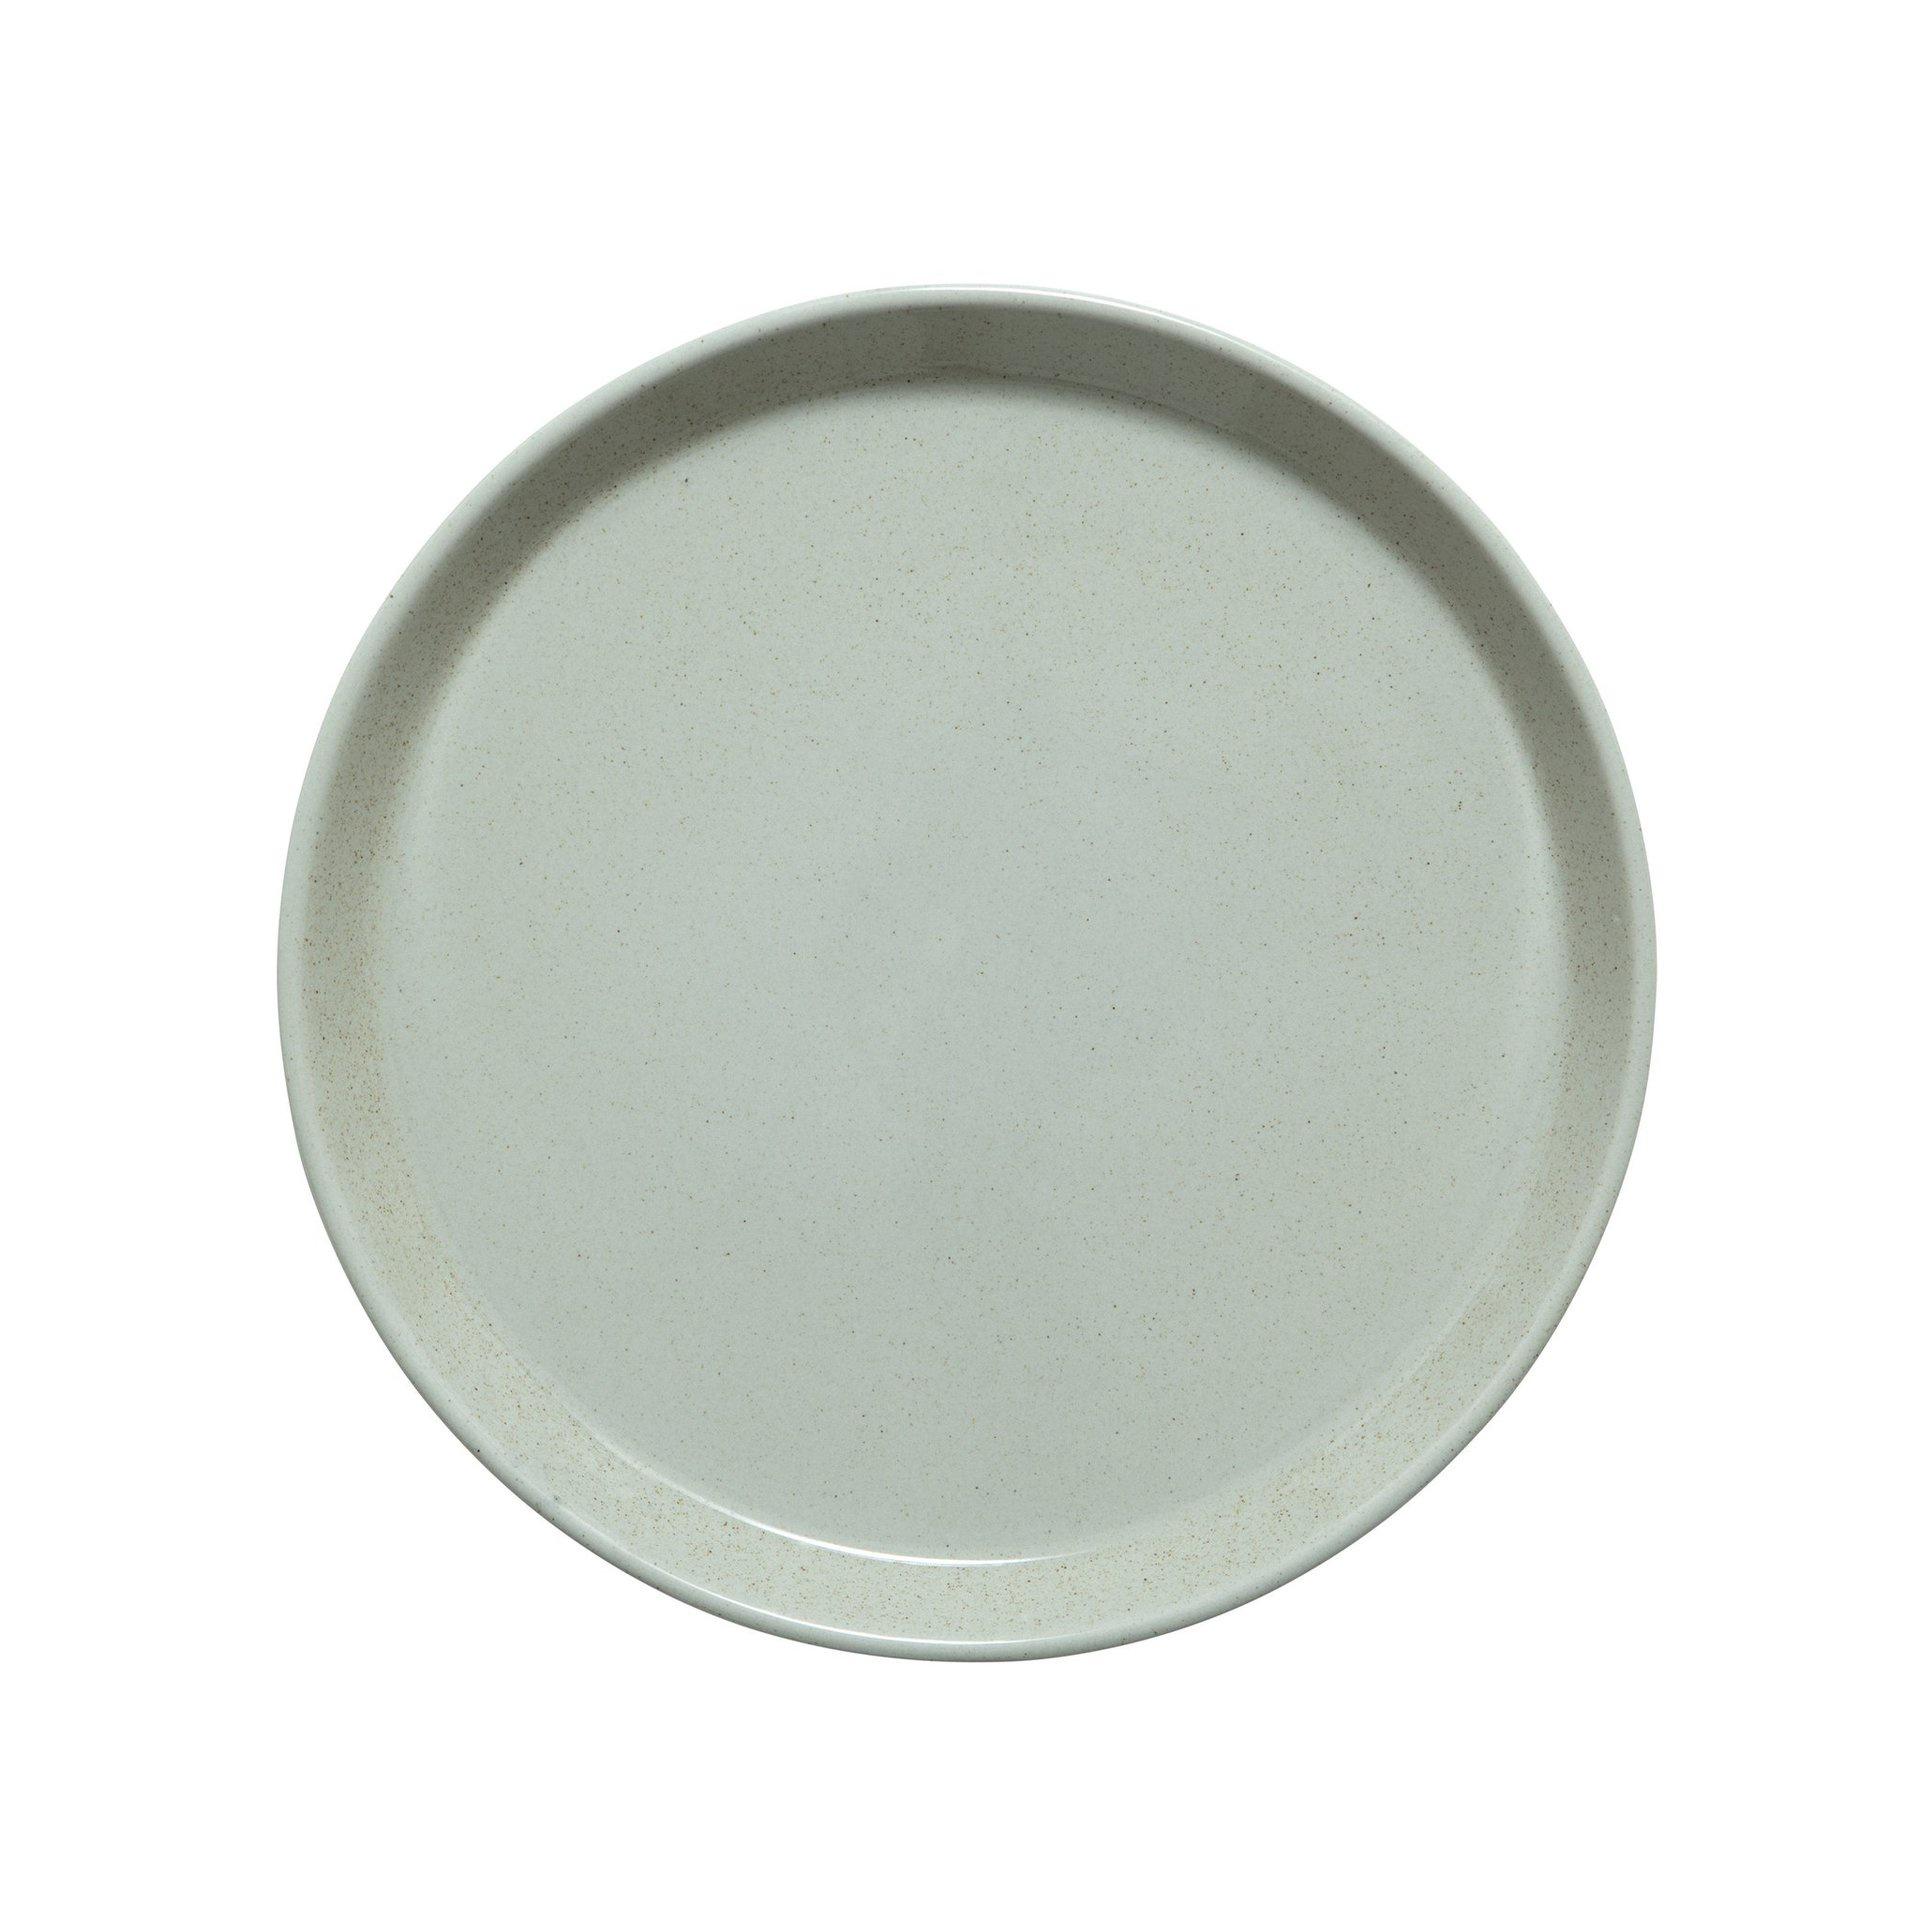 Milk & Sugar Alfie Dinner Plate Mist